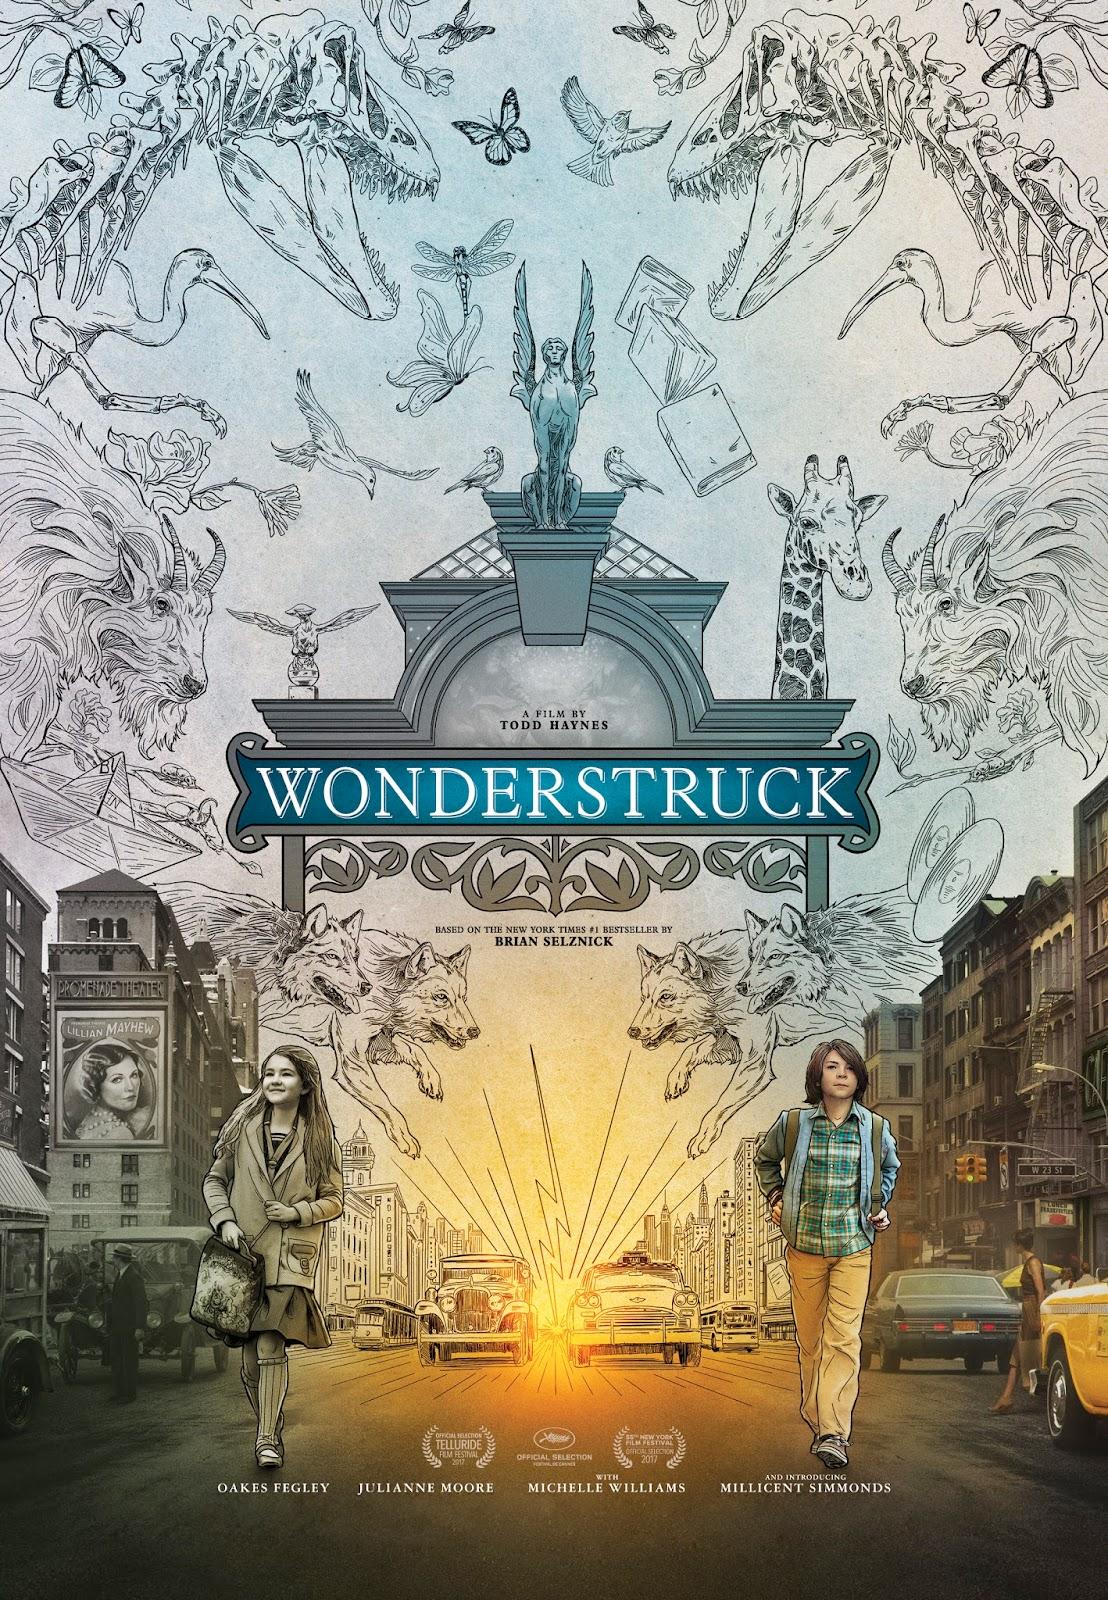 Wonderstruck [2017] [DVDR] [NTSC] [CUSTOM HD] [Subtitulado]